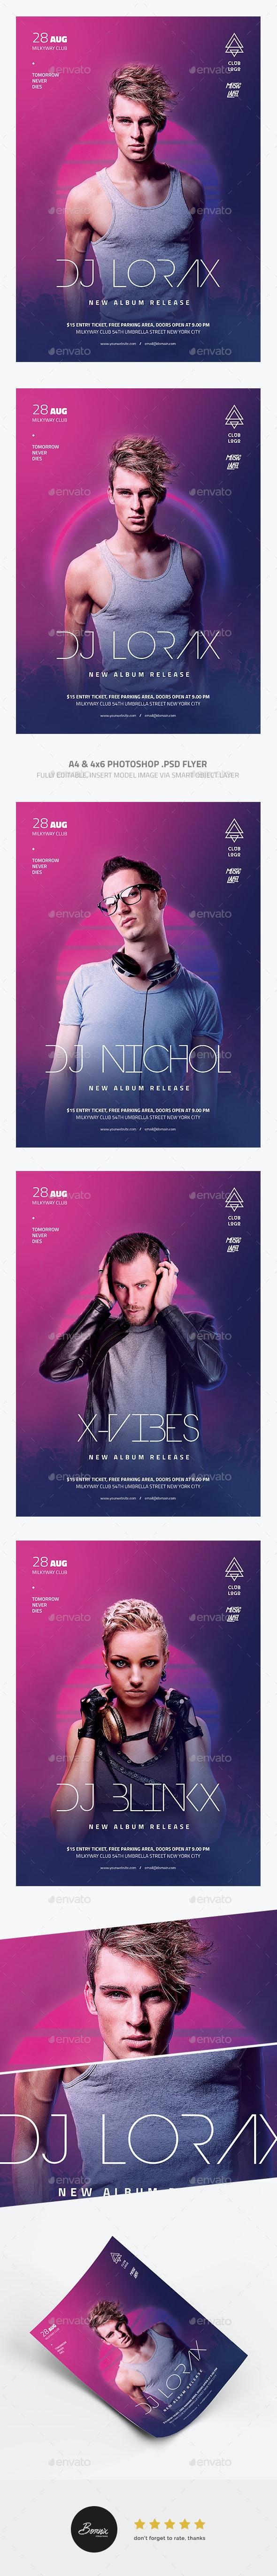 Minimal DJ Flyer - Concerts Events